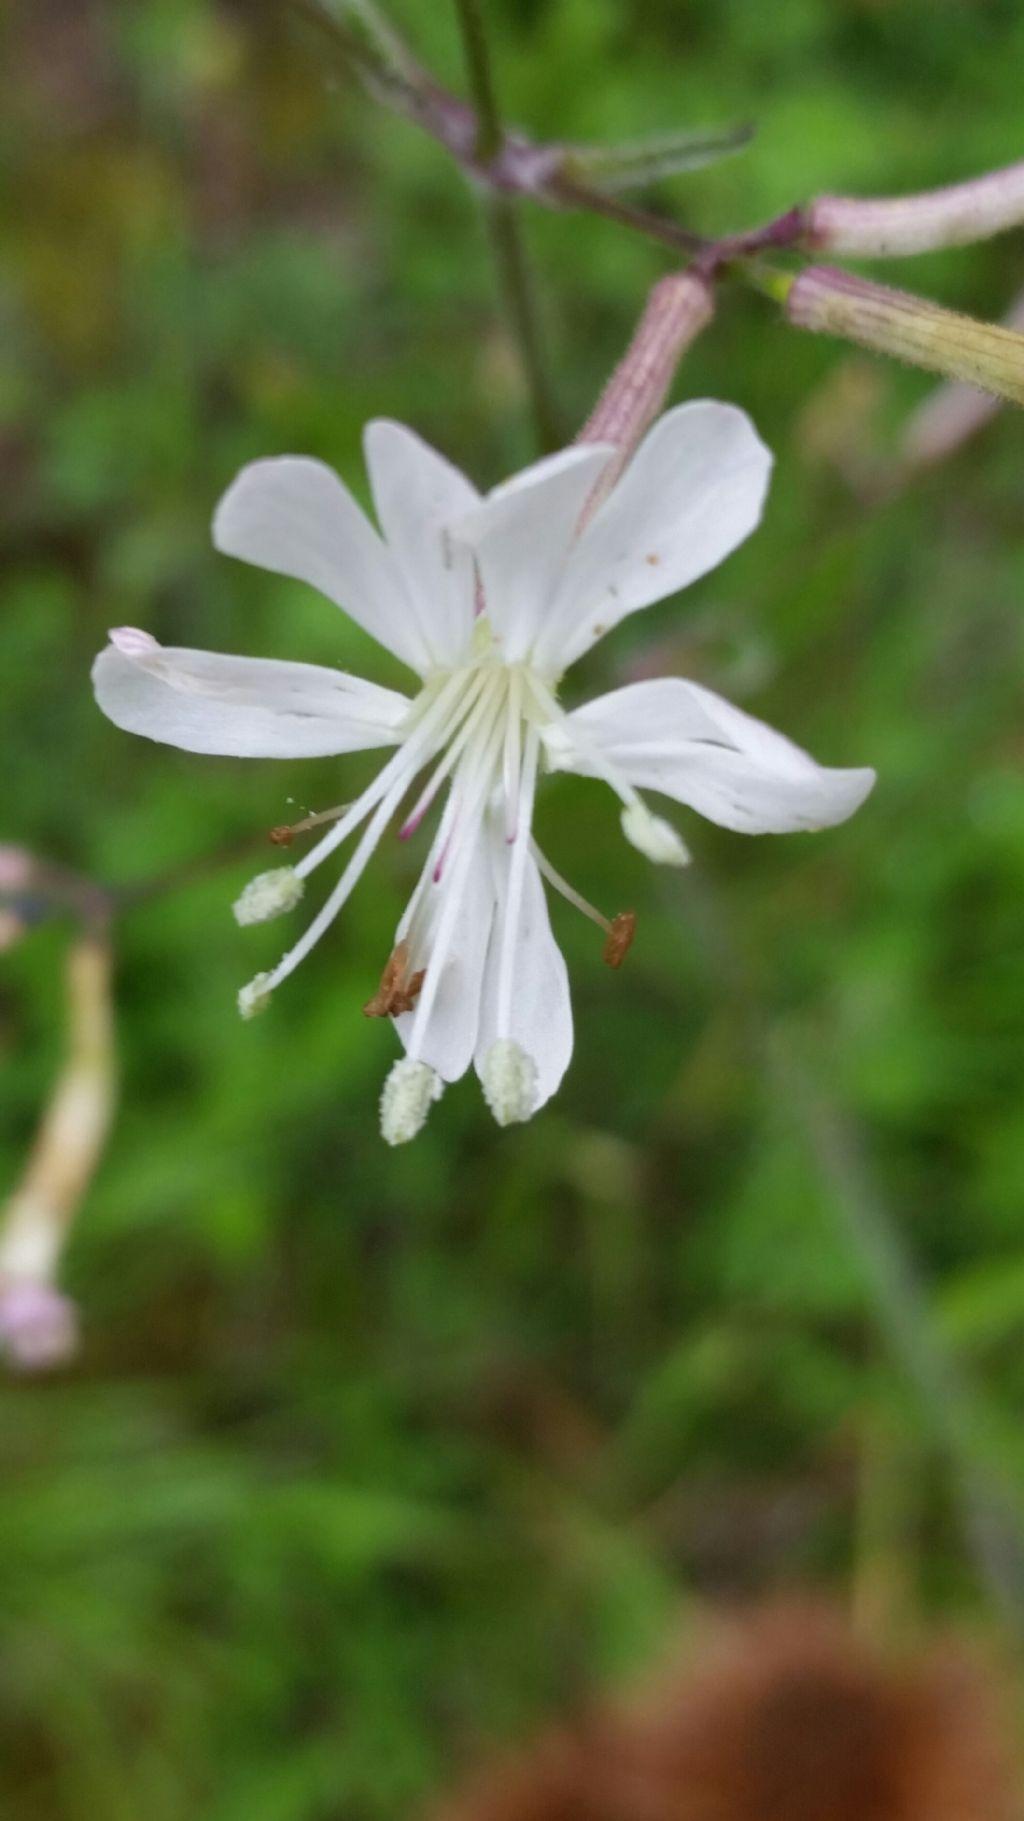 Silene sp. (Caryophyllaceae)